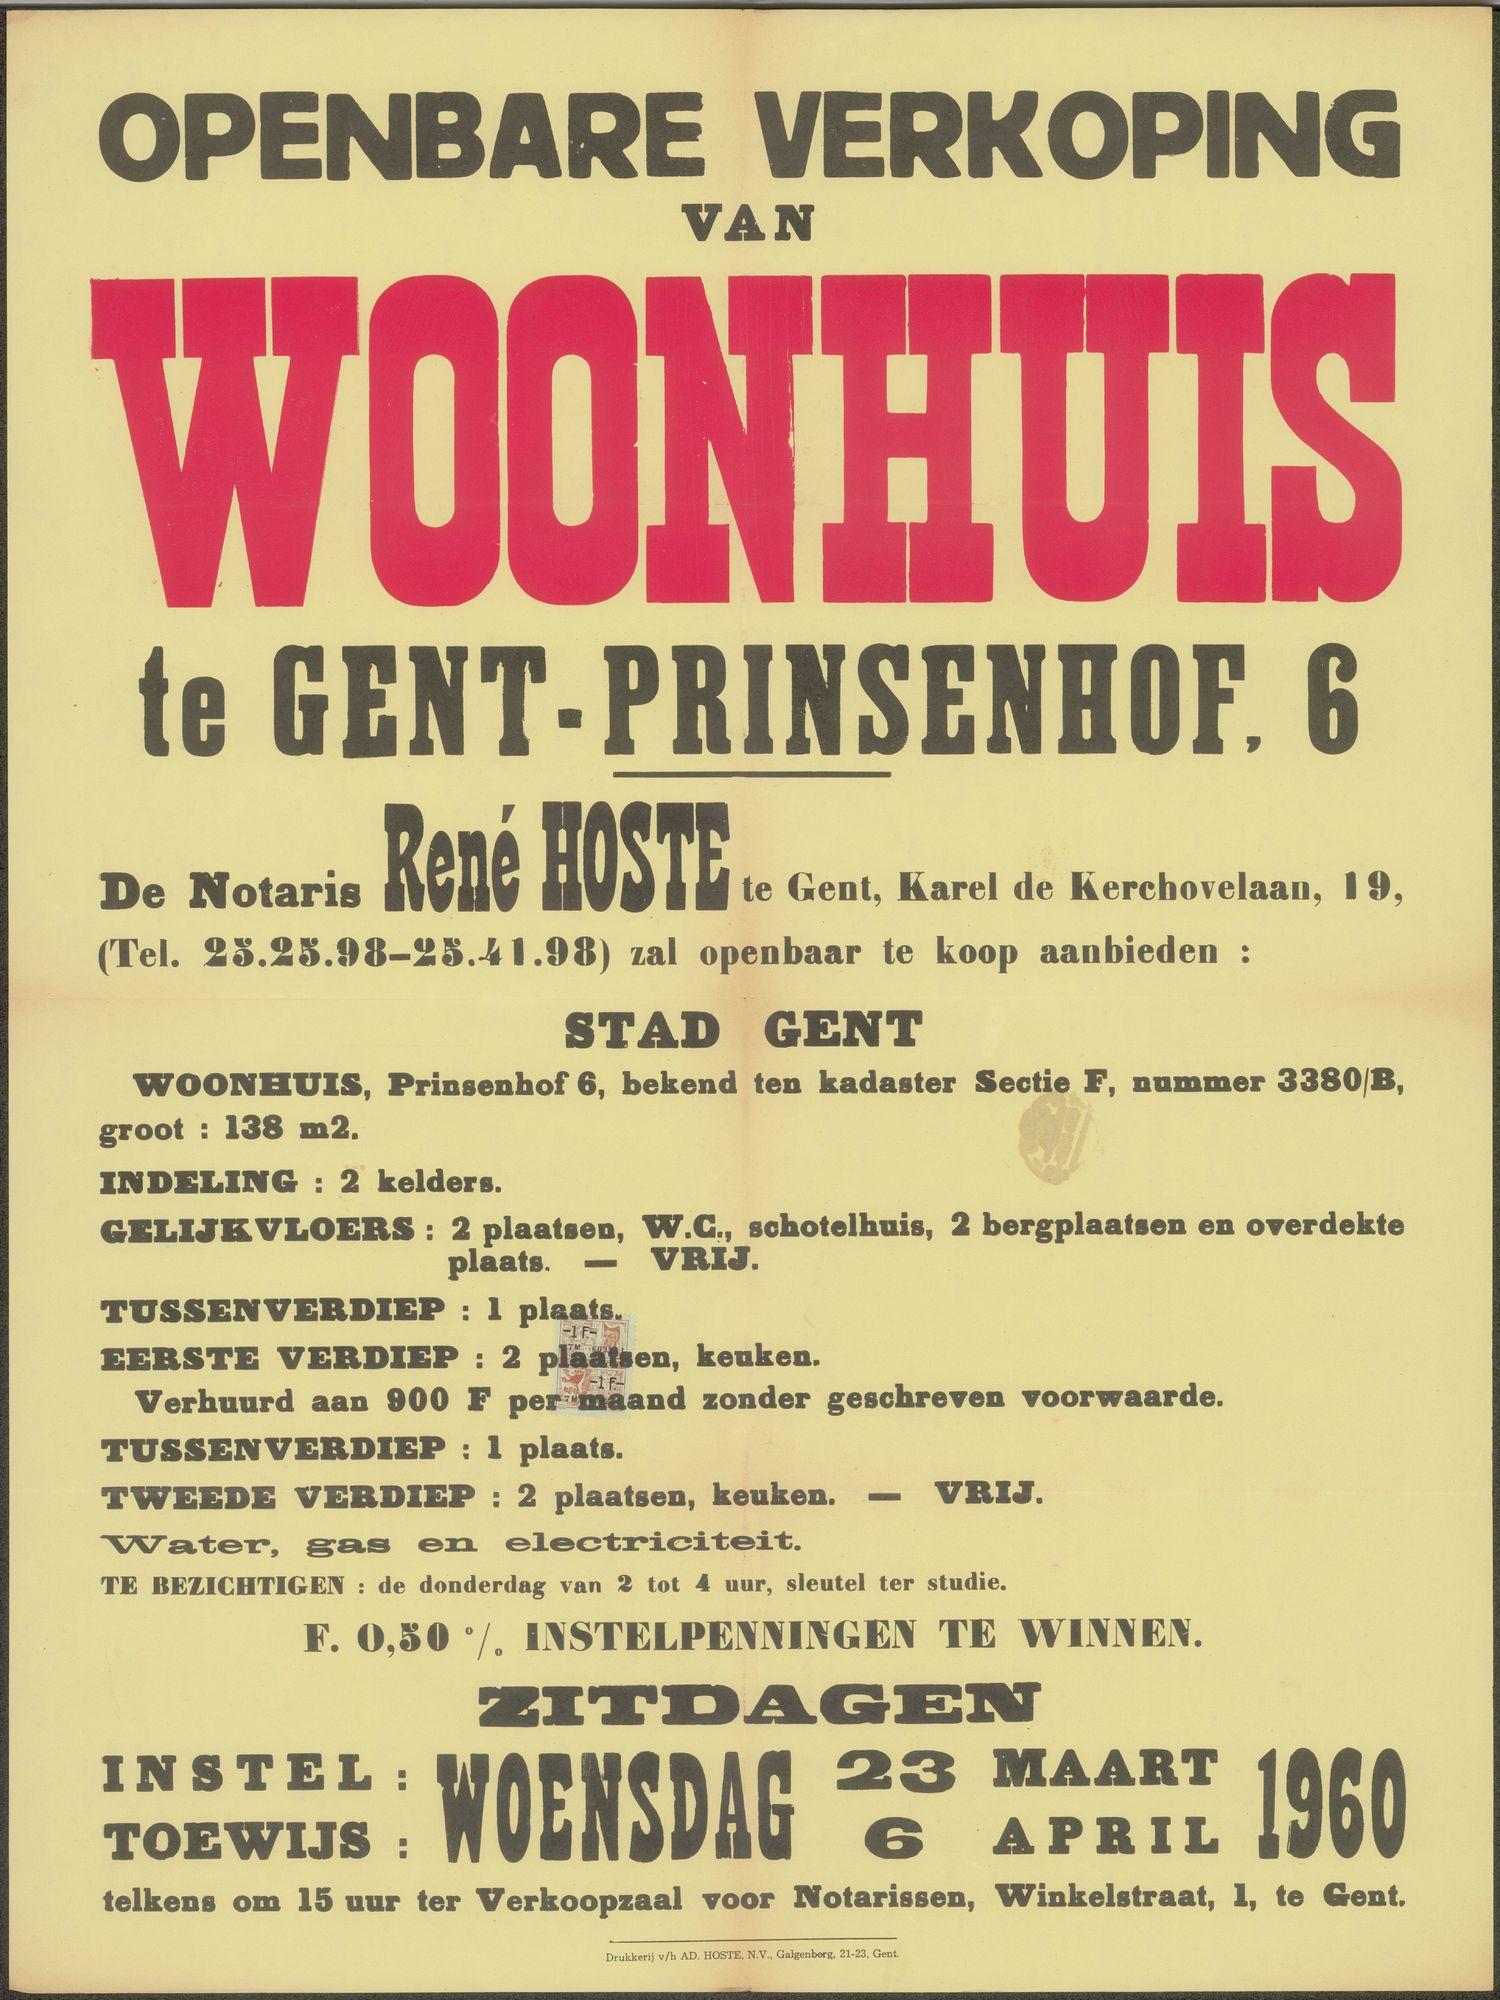 Openbare verkoop van woonhuis te Gent - Prinsenhof, nr.6, Gent, 6 april 1960